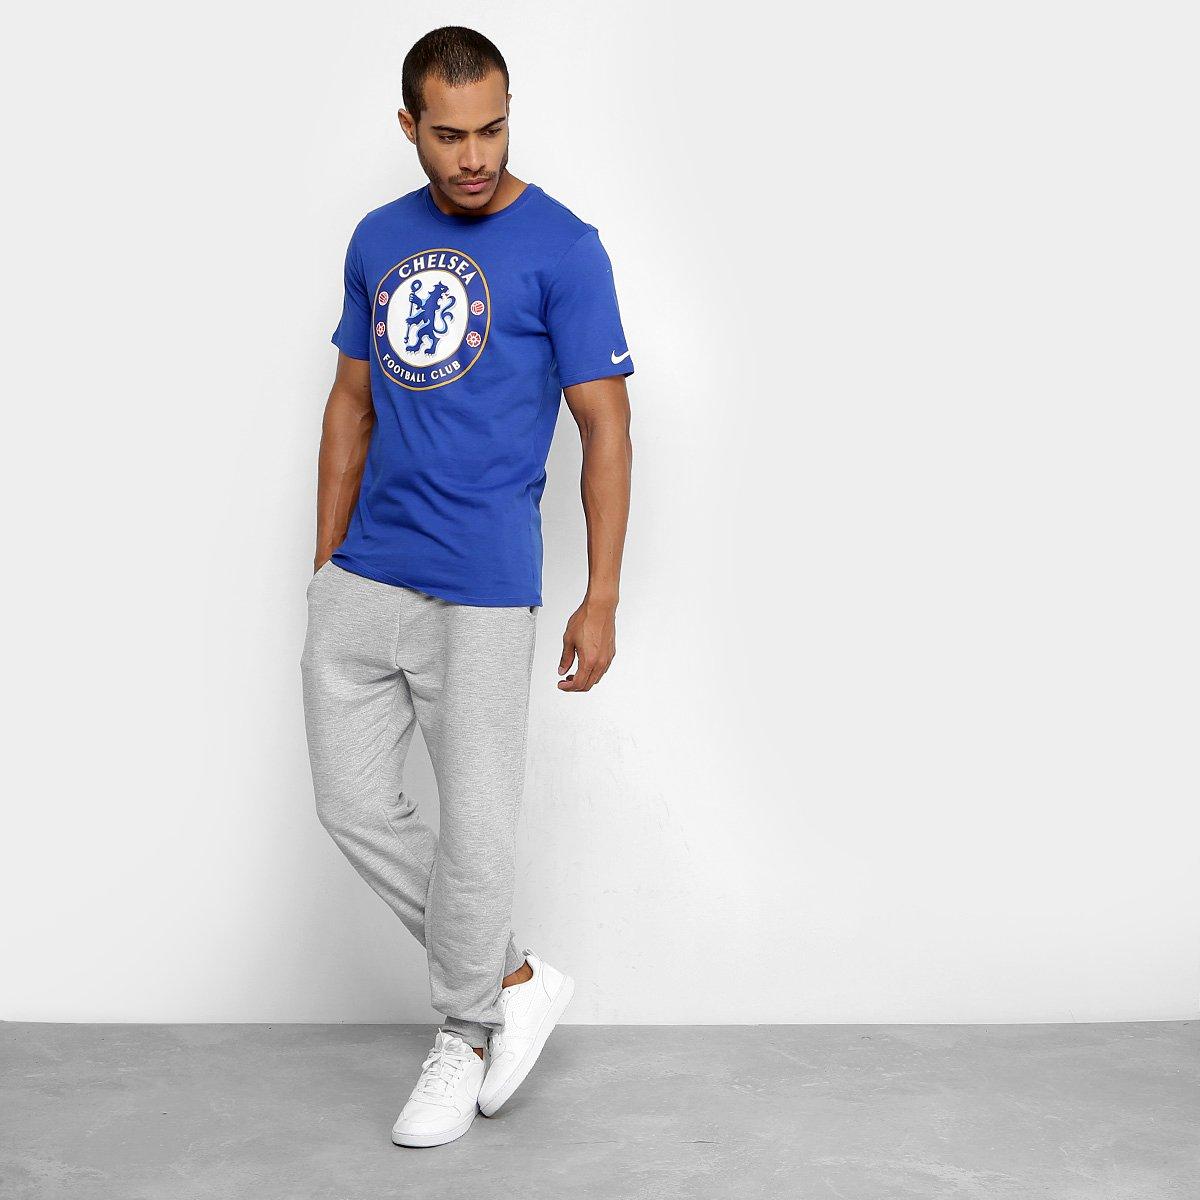 ee7e562a94 Camiseta Chelsea Evergreen Crest Nike Masculina - Compre Agora ...